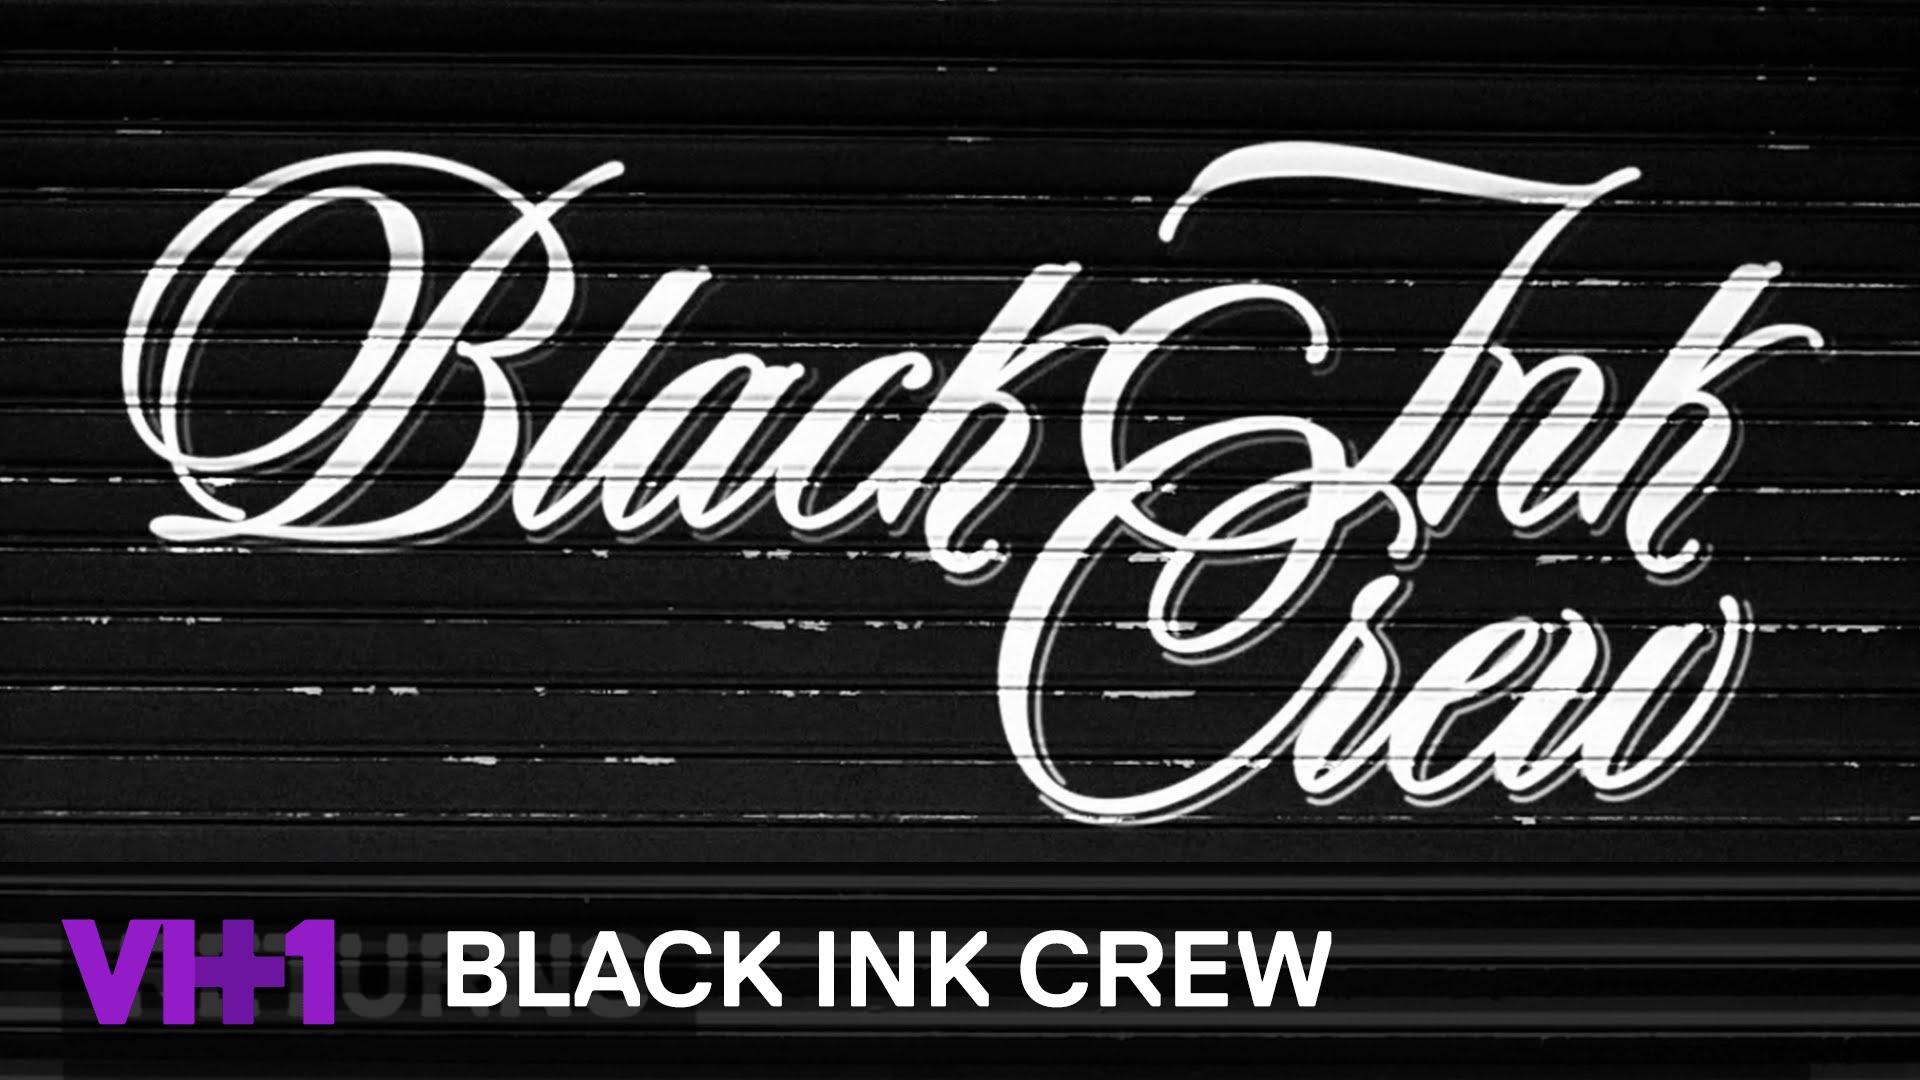 vh-1 black ink crew logo